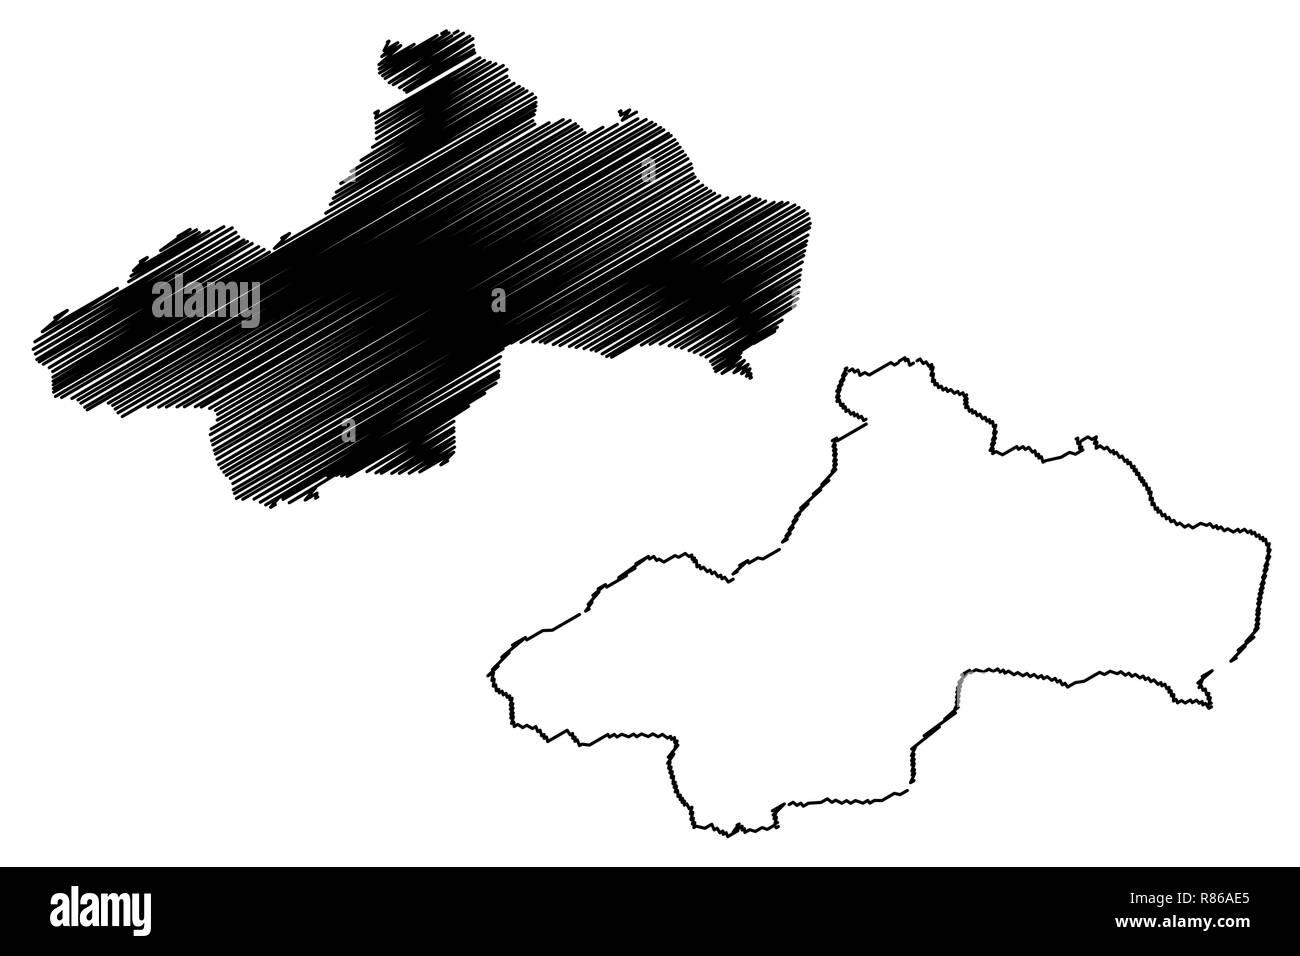 Tokat (Provinces of the Republic of Turkey) map vector illustration, scribble sketch Tokat ili map - Stock Image